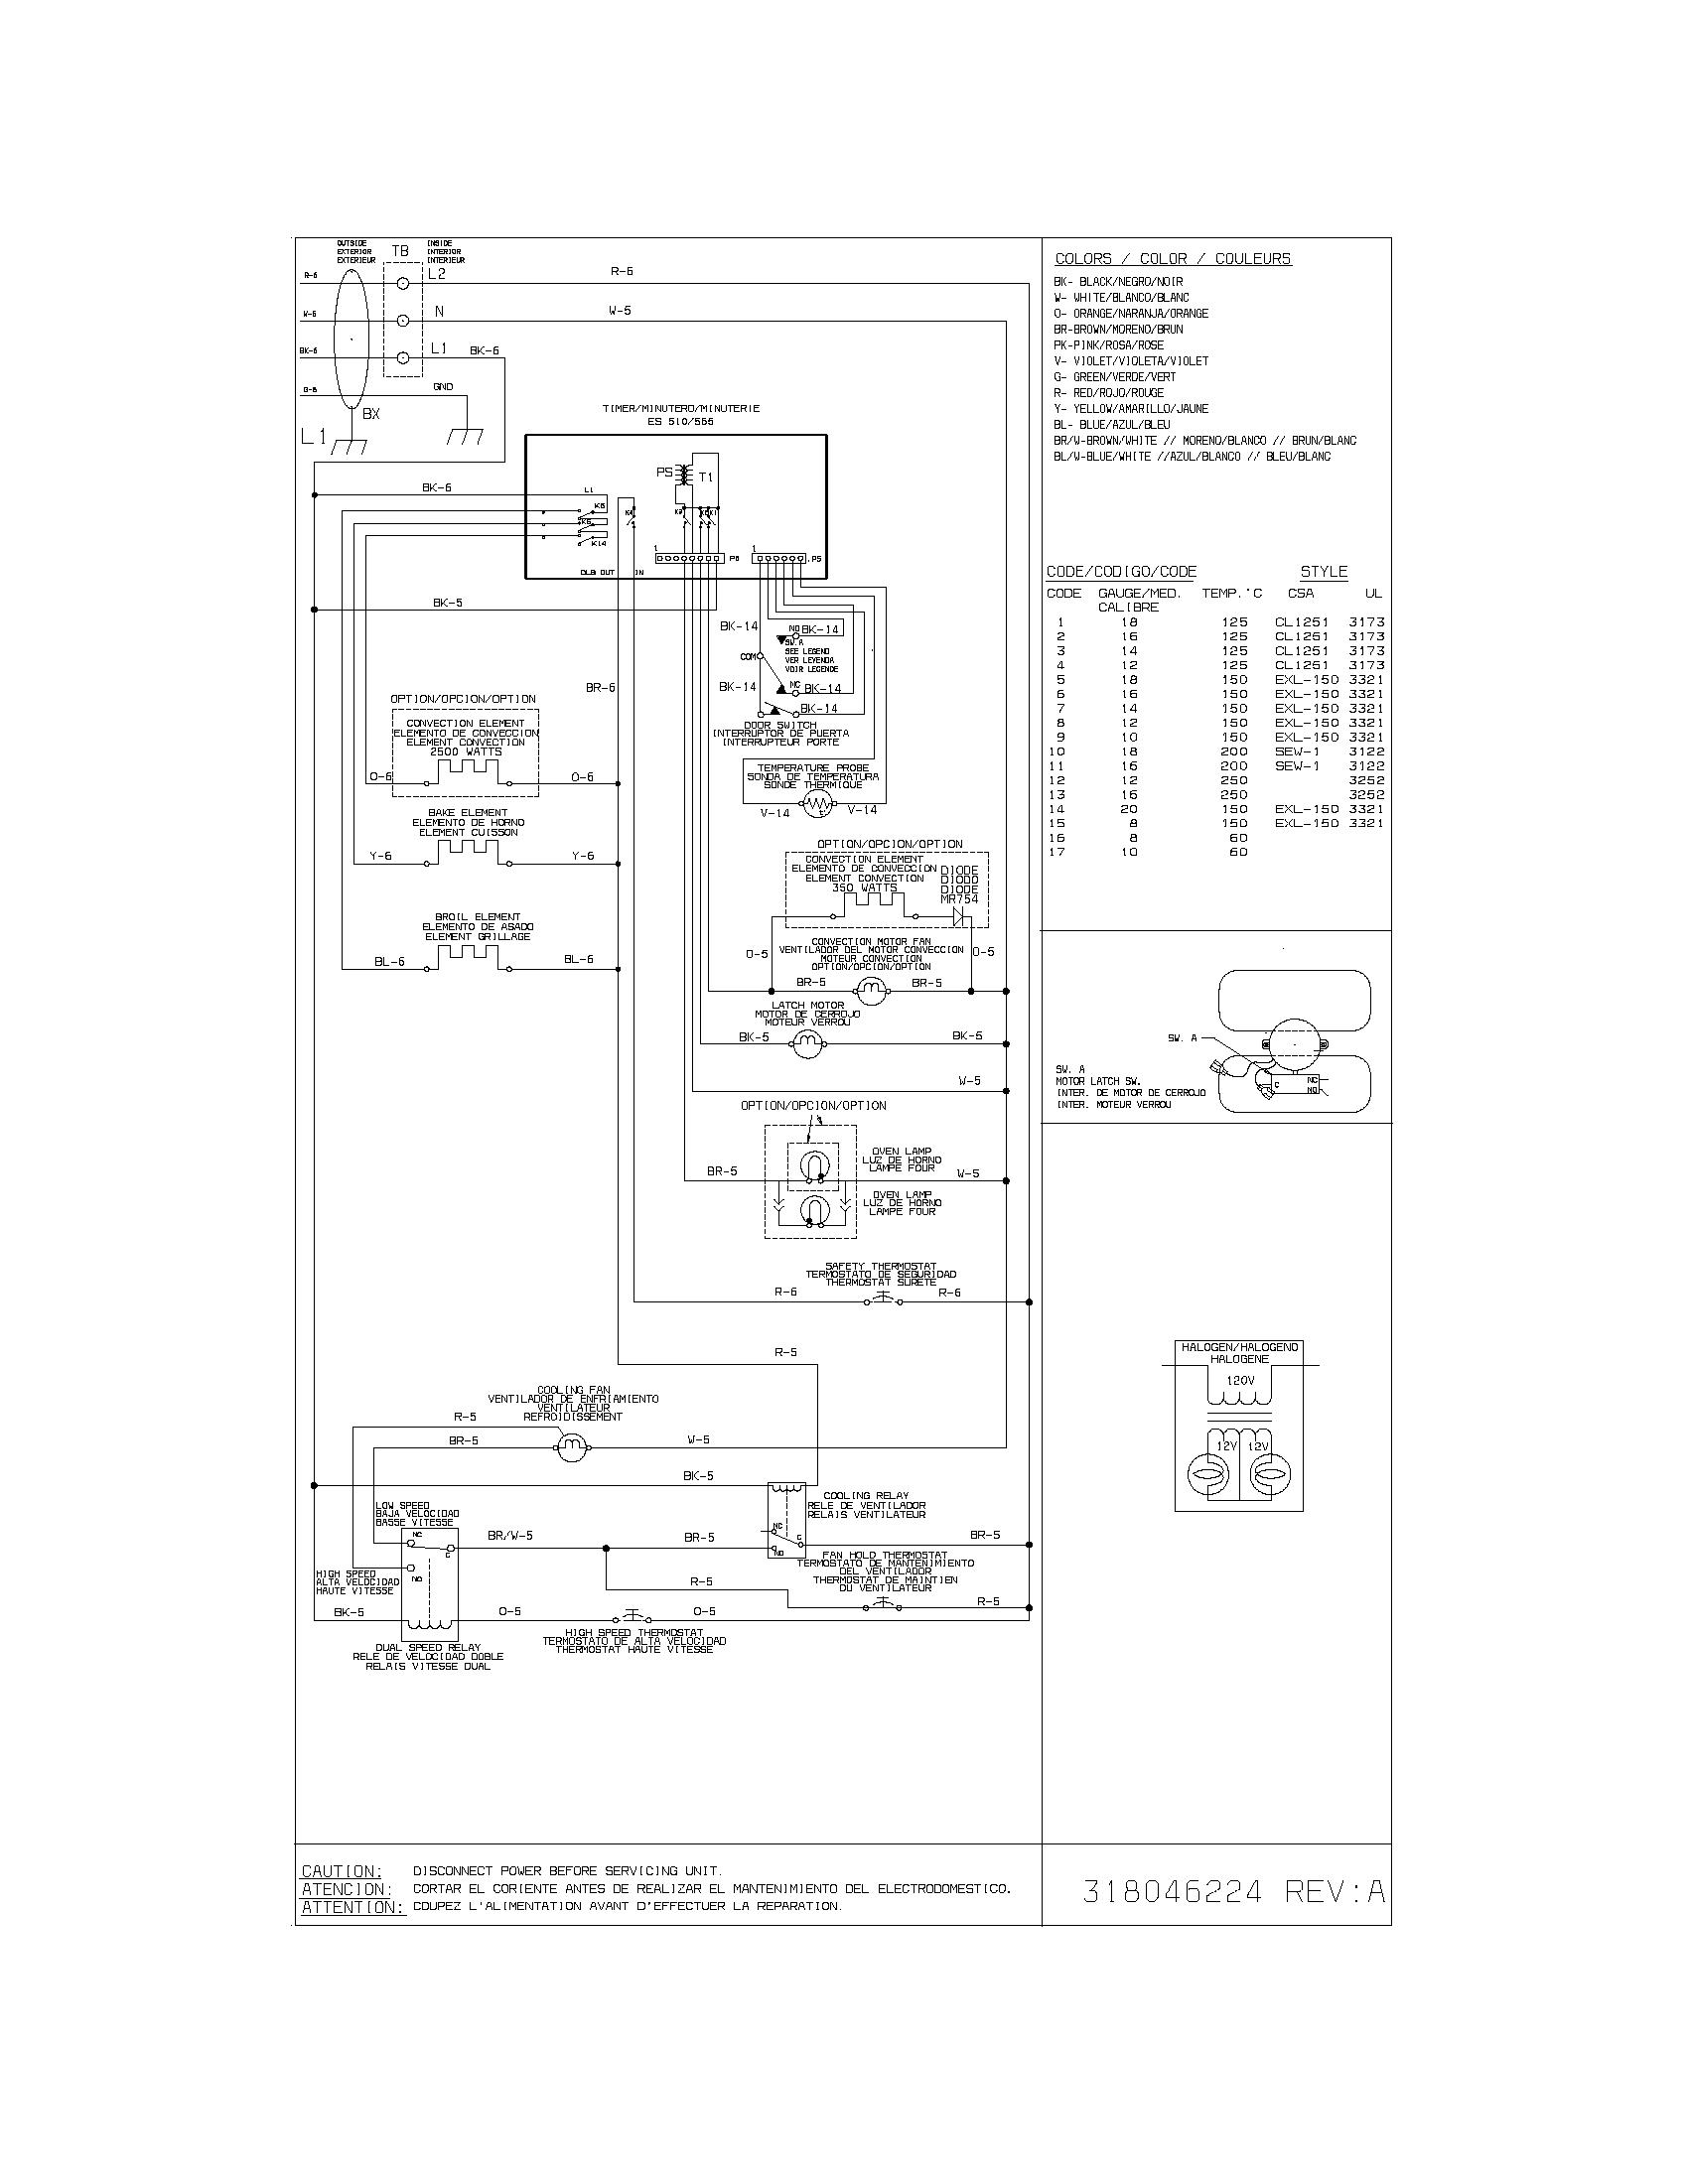 Sumg-100 Wiring Diagram